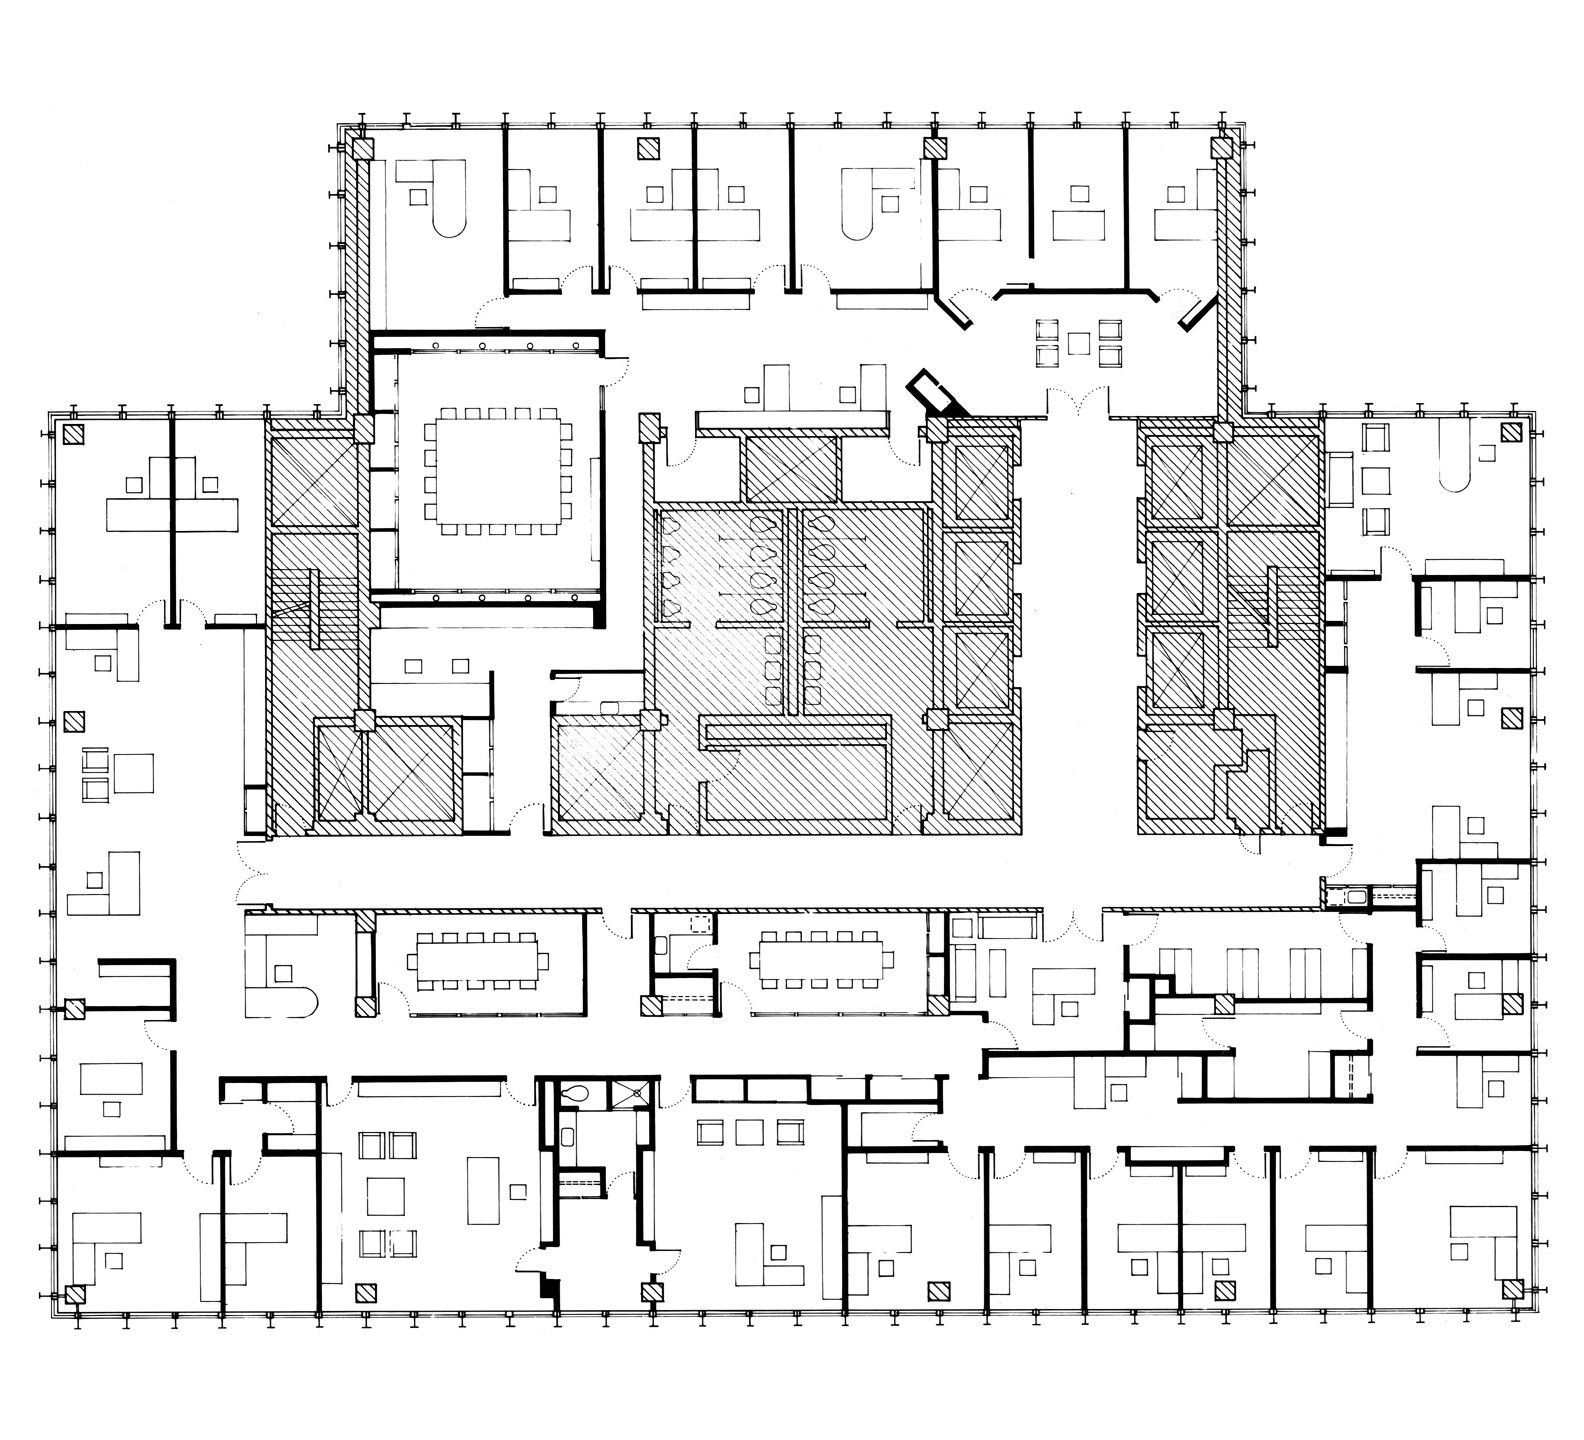 Seagram Building Plan In The Seagram Building,